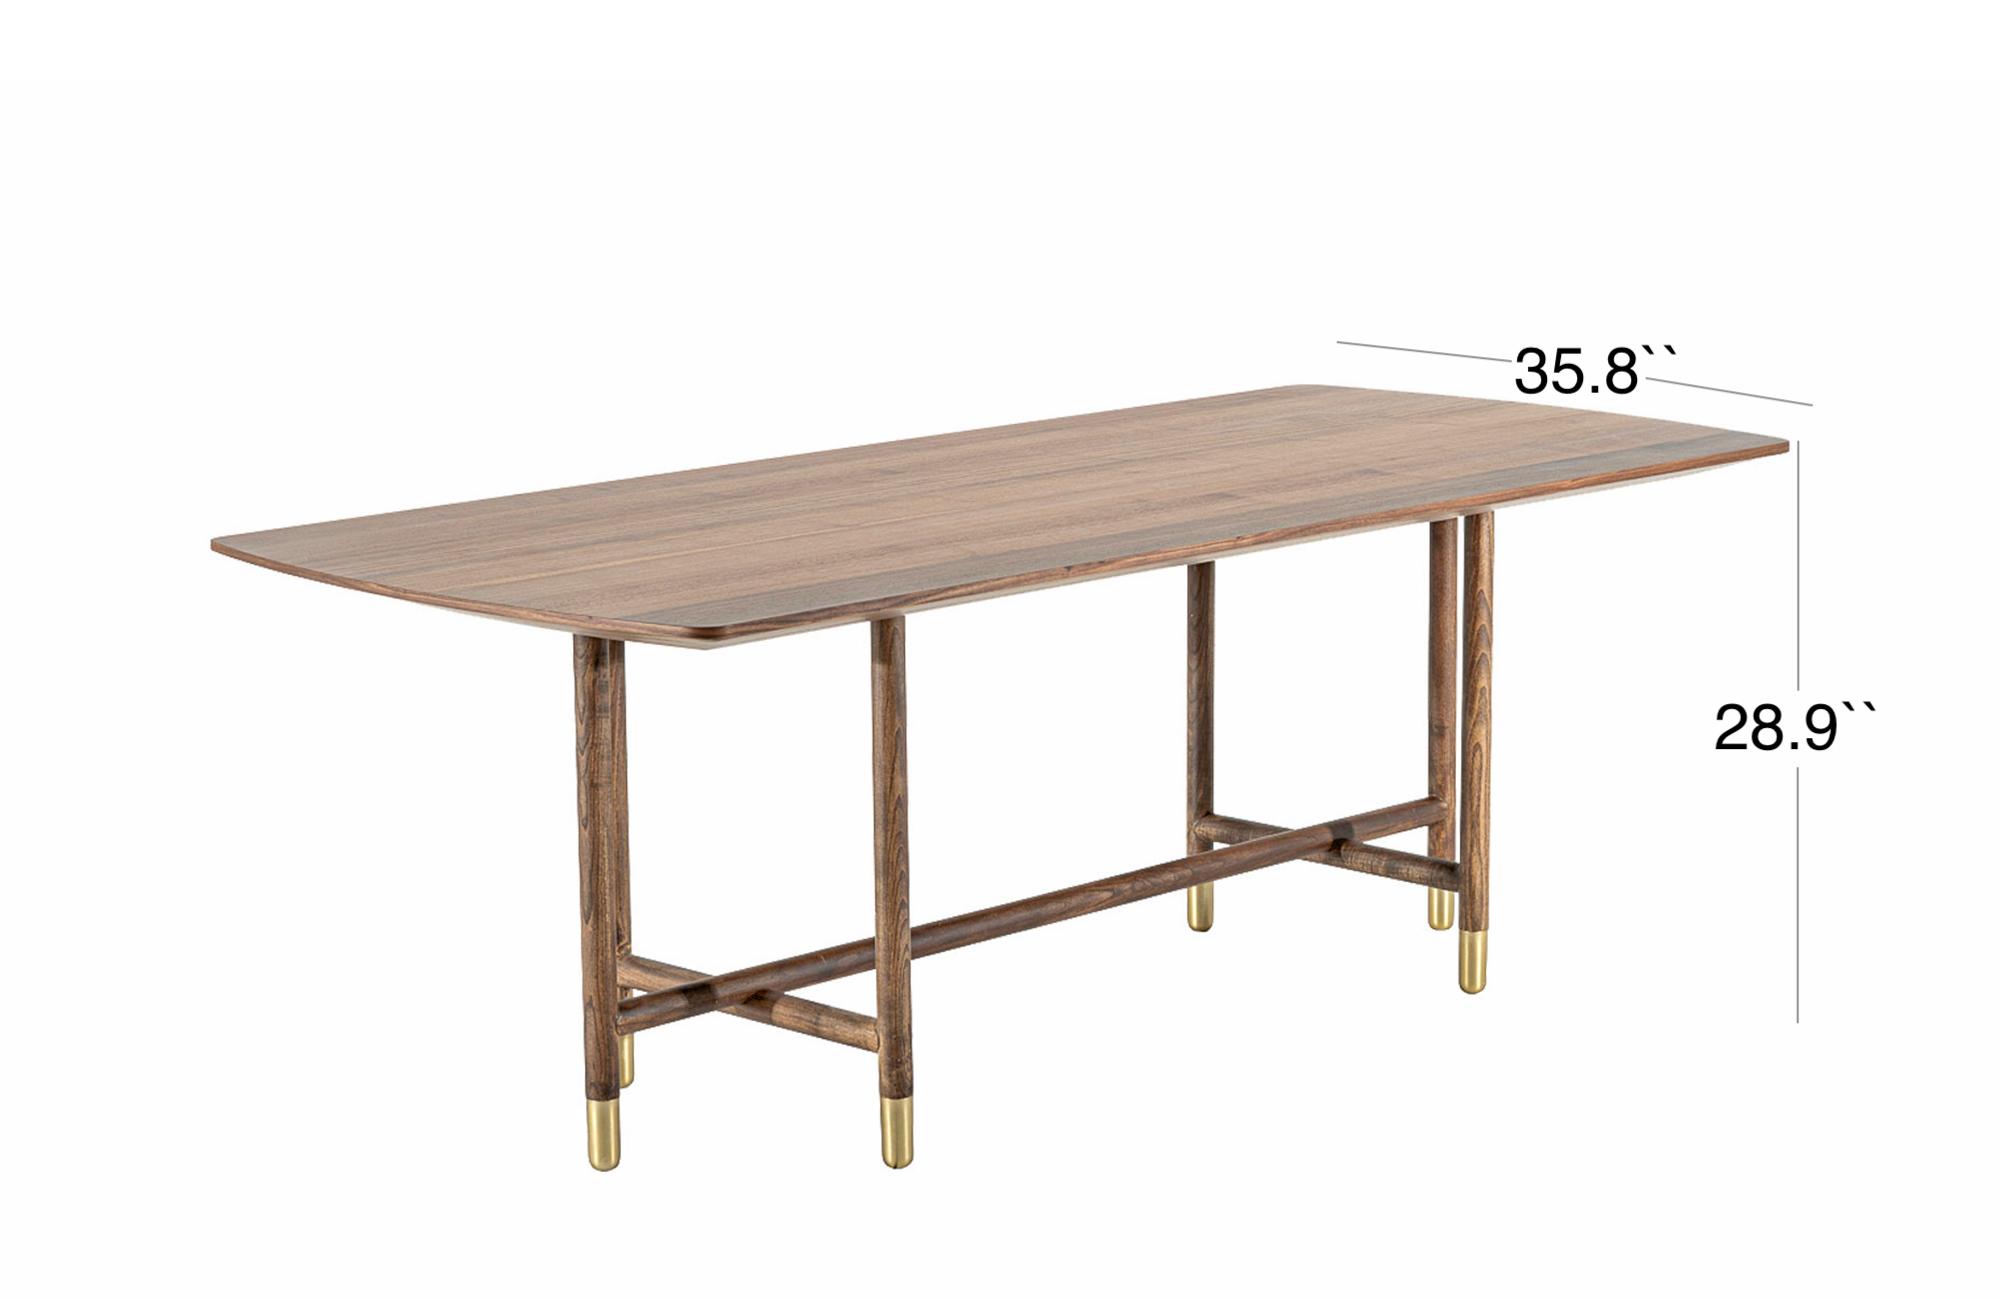 Pierra Dining Table